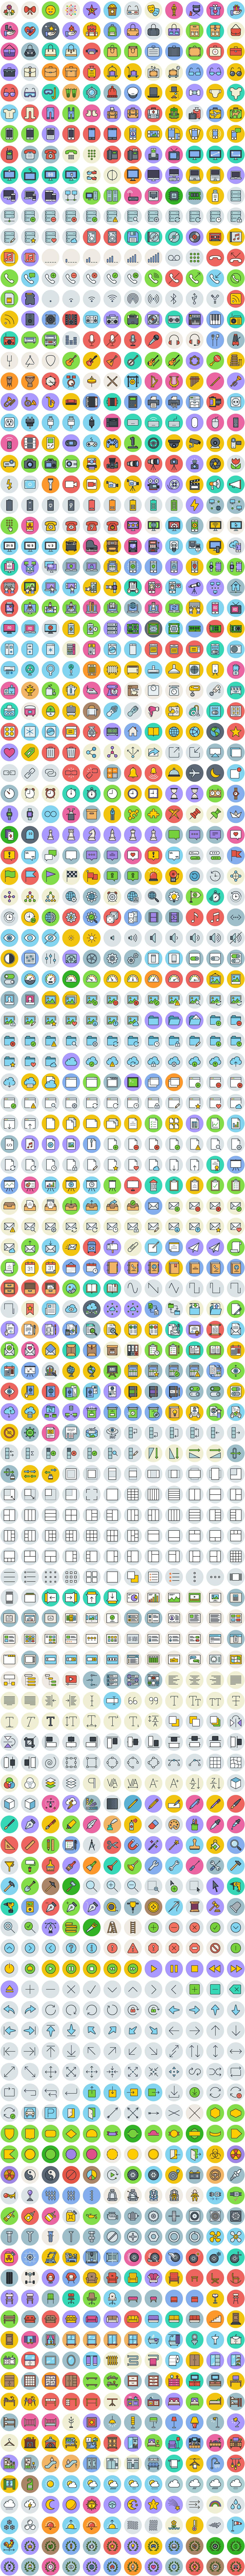 Unigrid Flat icons full 2